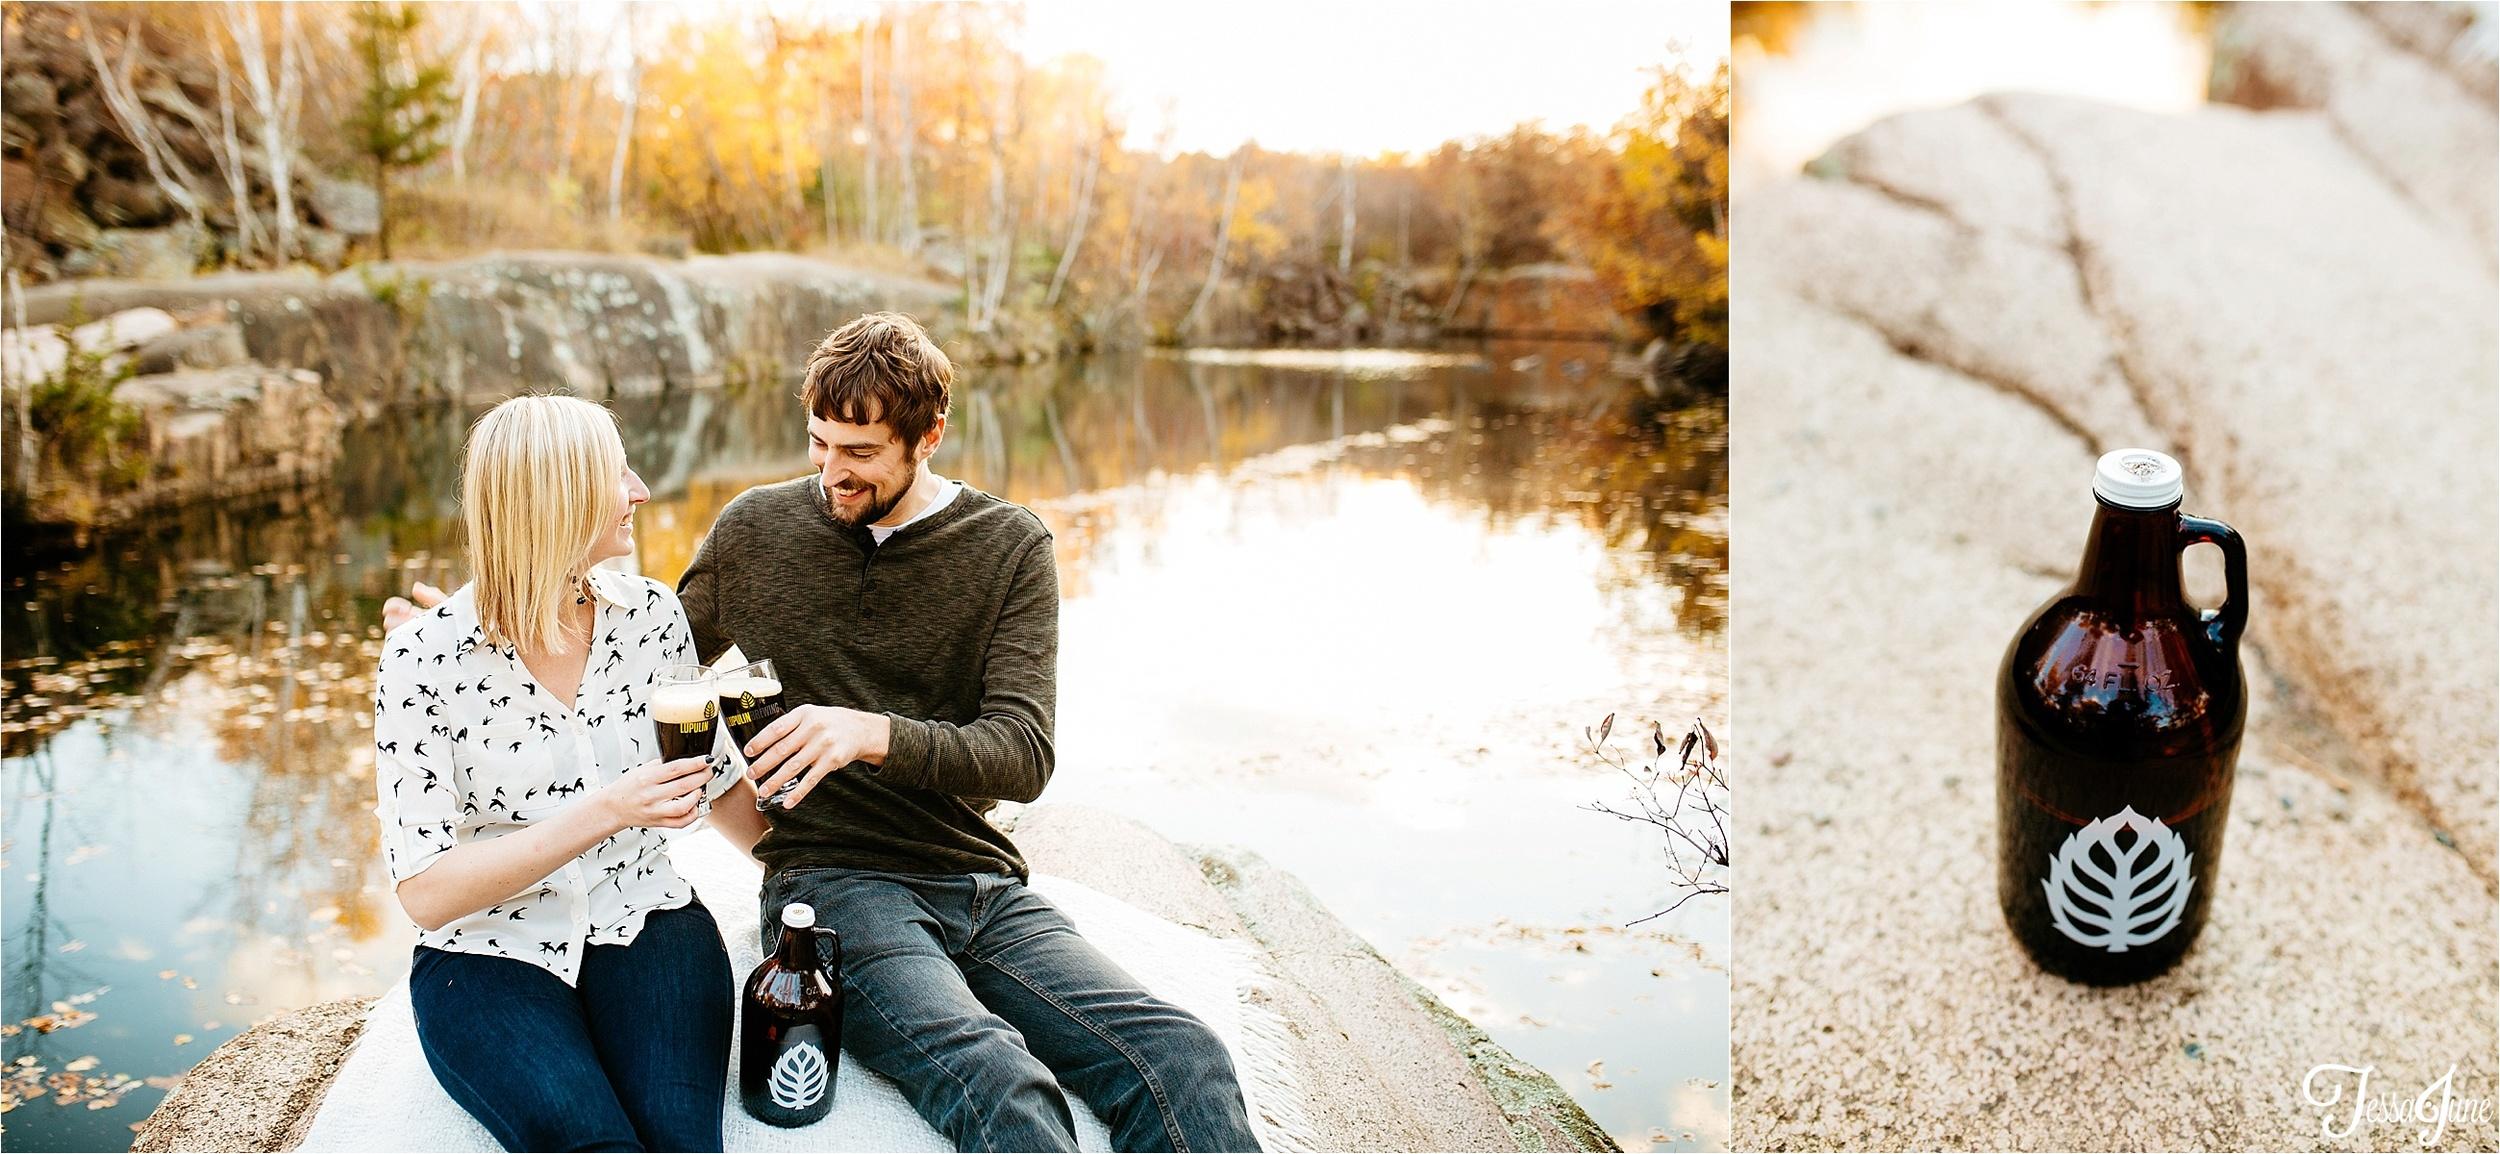 st-cloud-minnesota-wedding-photographer-unique-waite-park-quarries-fall-beer